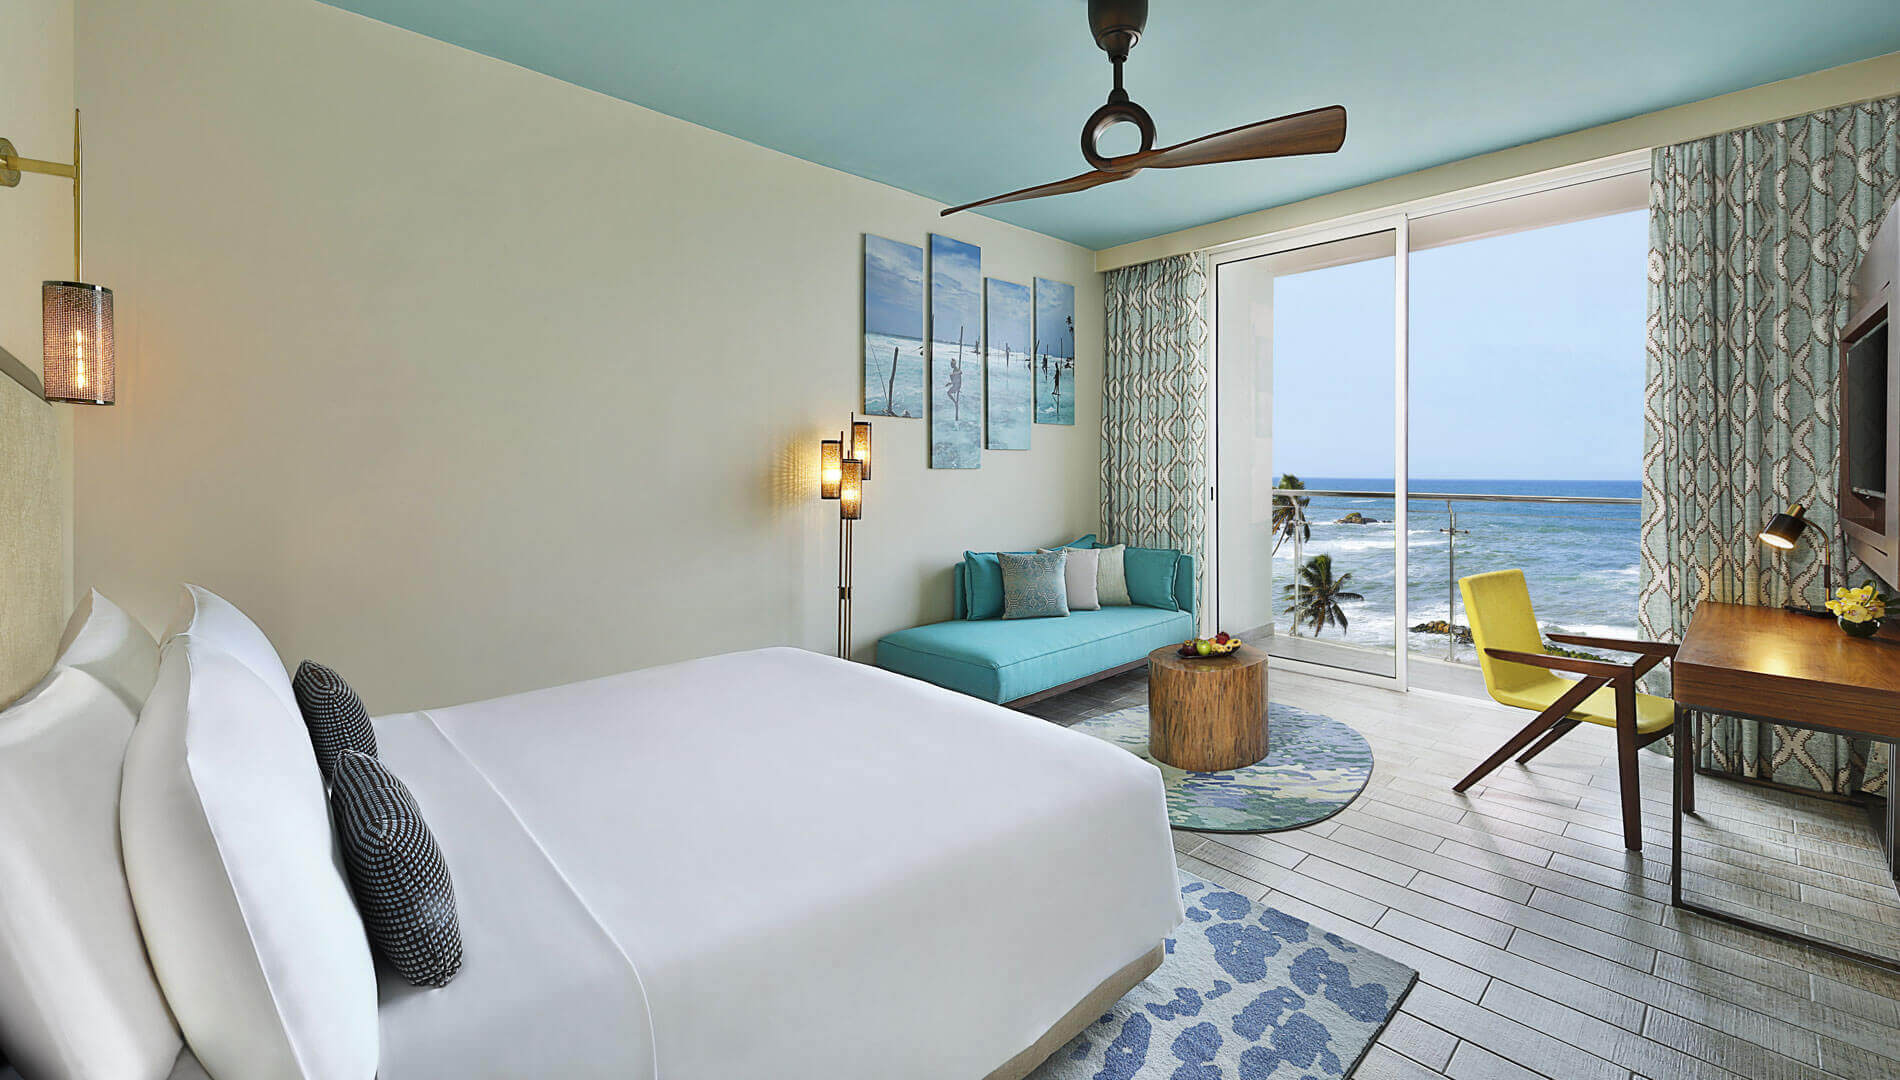 Top 21 New Luxury Beach Resorts Opening In 2017